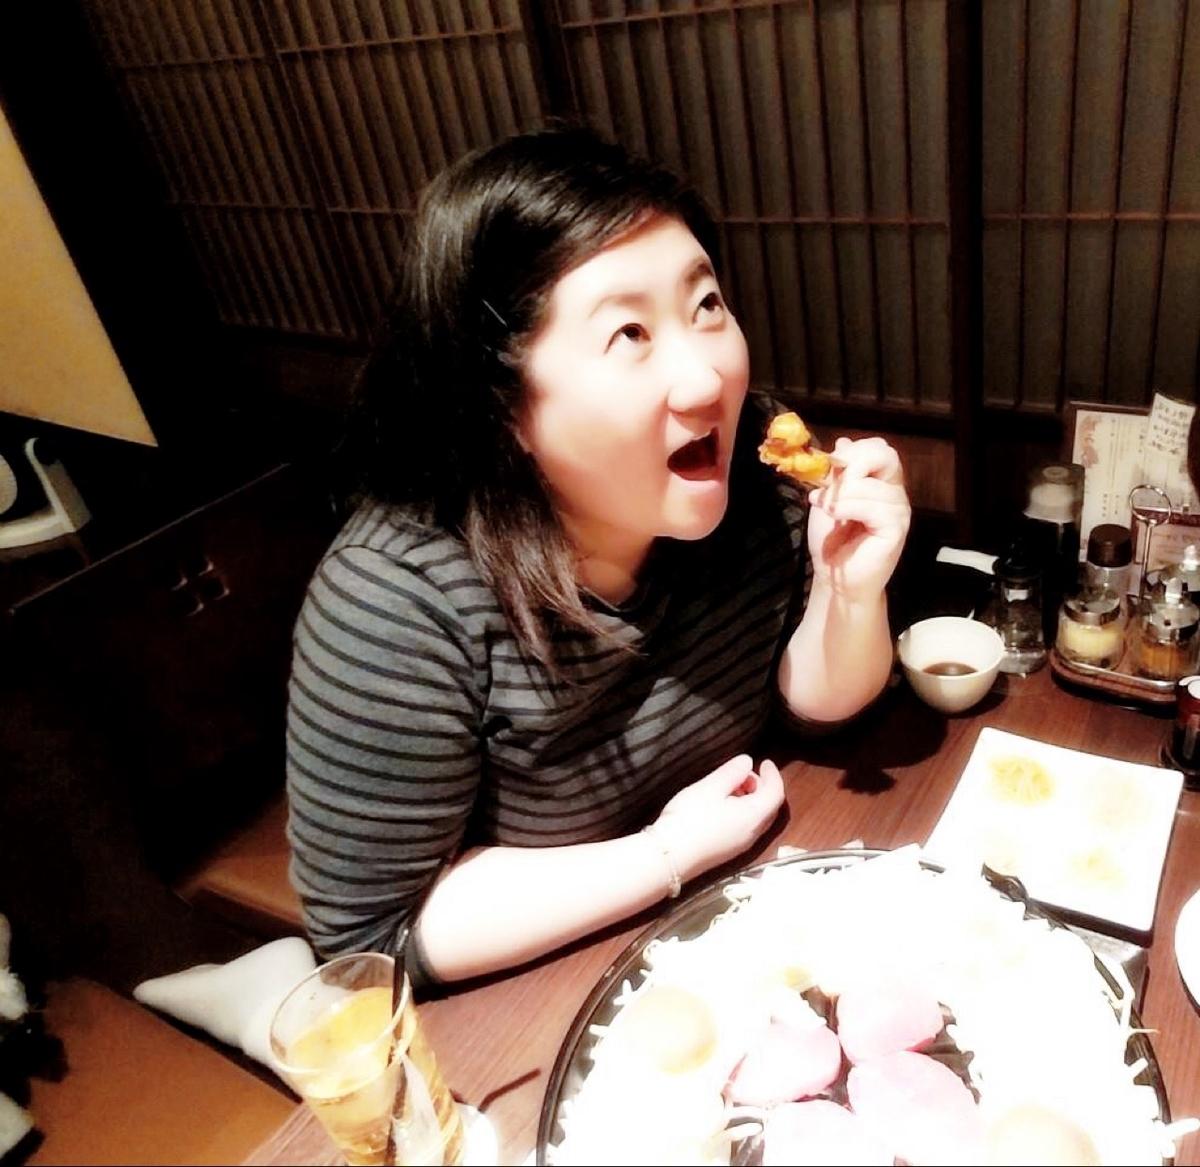 f:id:amane-yuuna:20200712103849j:plain